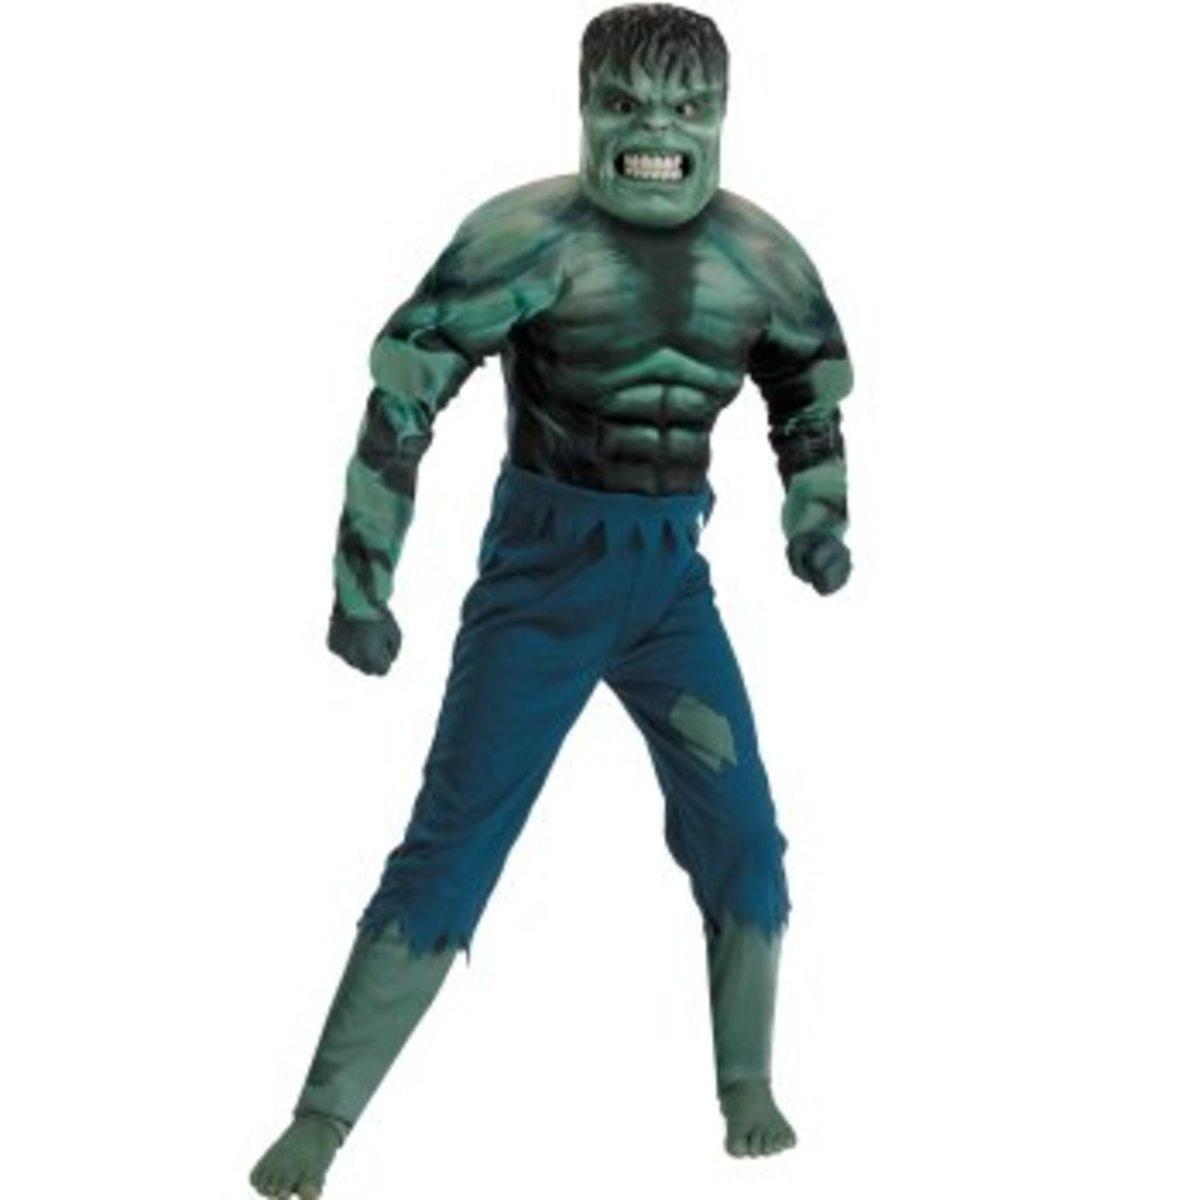 Hulk movie costume 2008